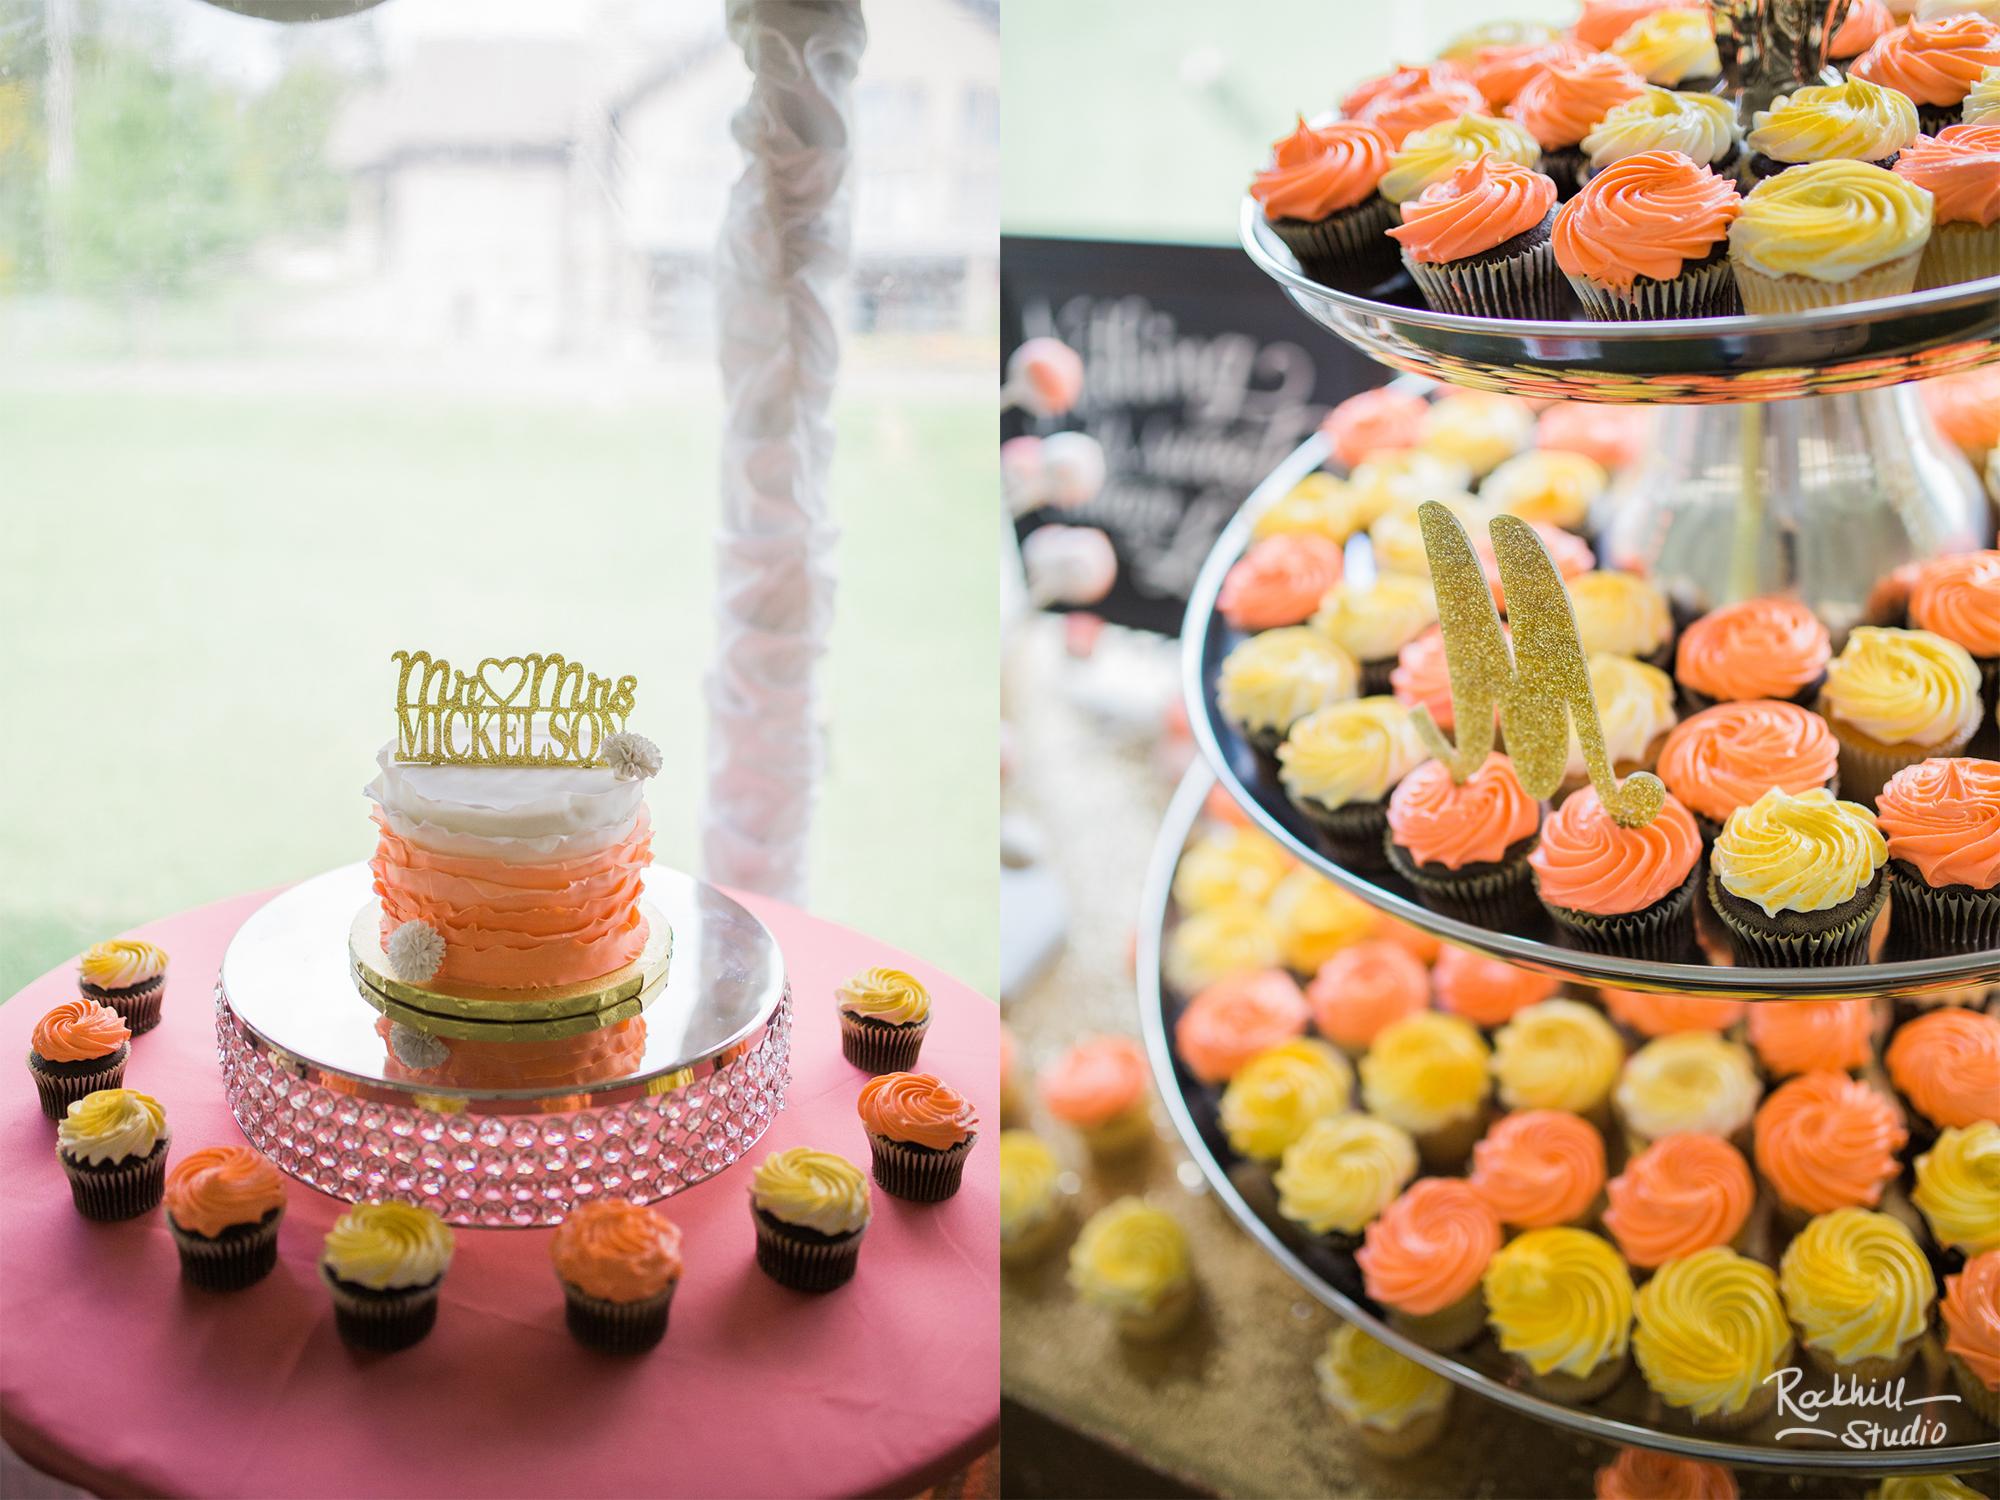 rockhill-studio-newberry-michigan-wedding-curtis-upper-peninsula-mackinac-island-houghton-cupcakes.jpg